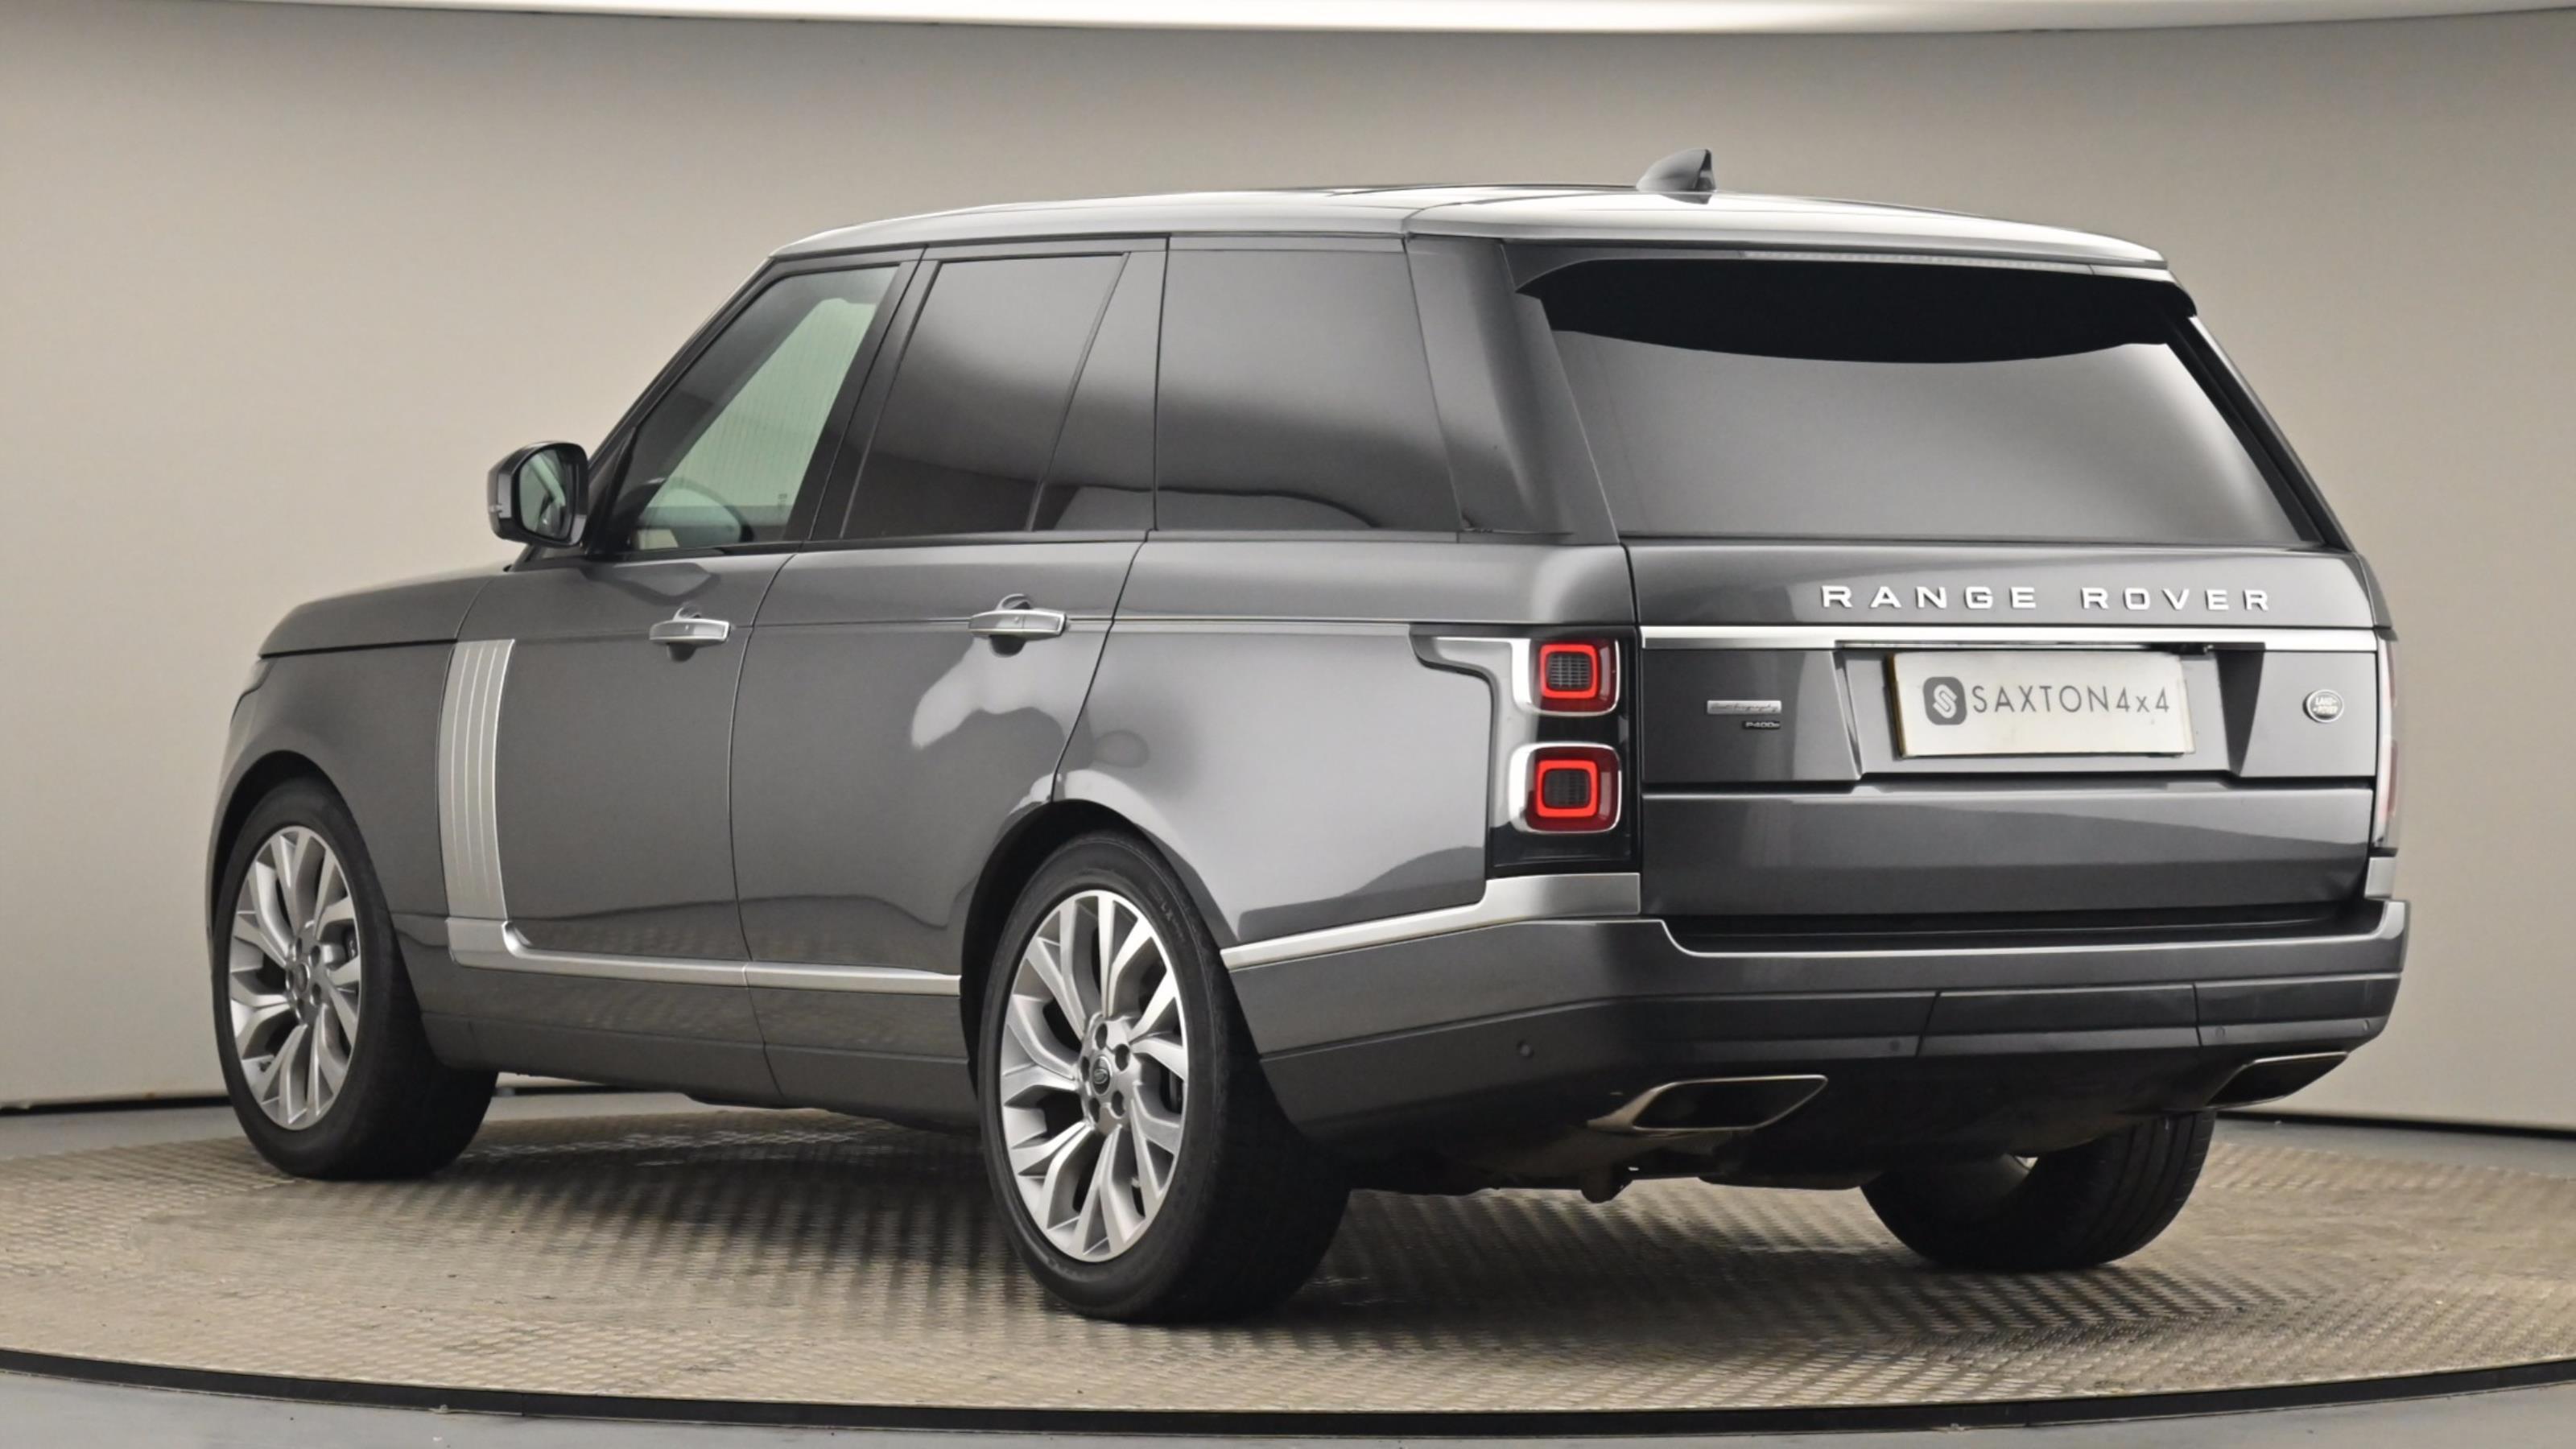 Used 2018 Land Rover RANGE ROVER 2.0 P400e Autobiography 4dr Auto GREY at Saxton4x4